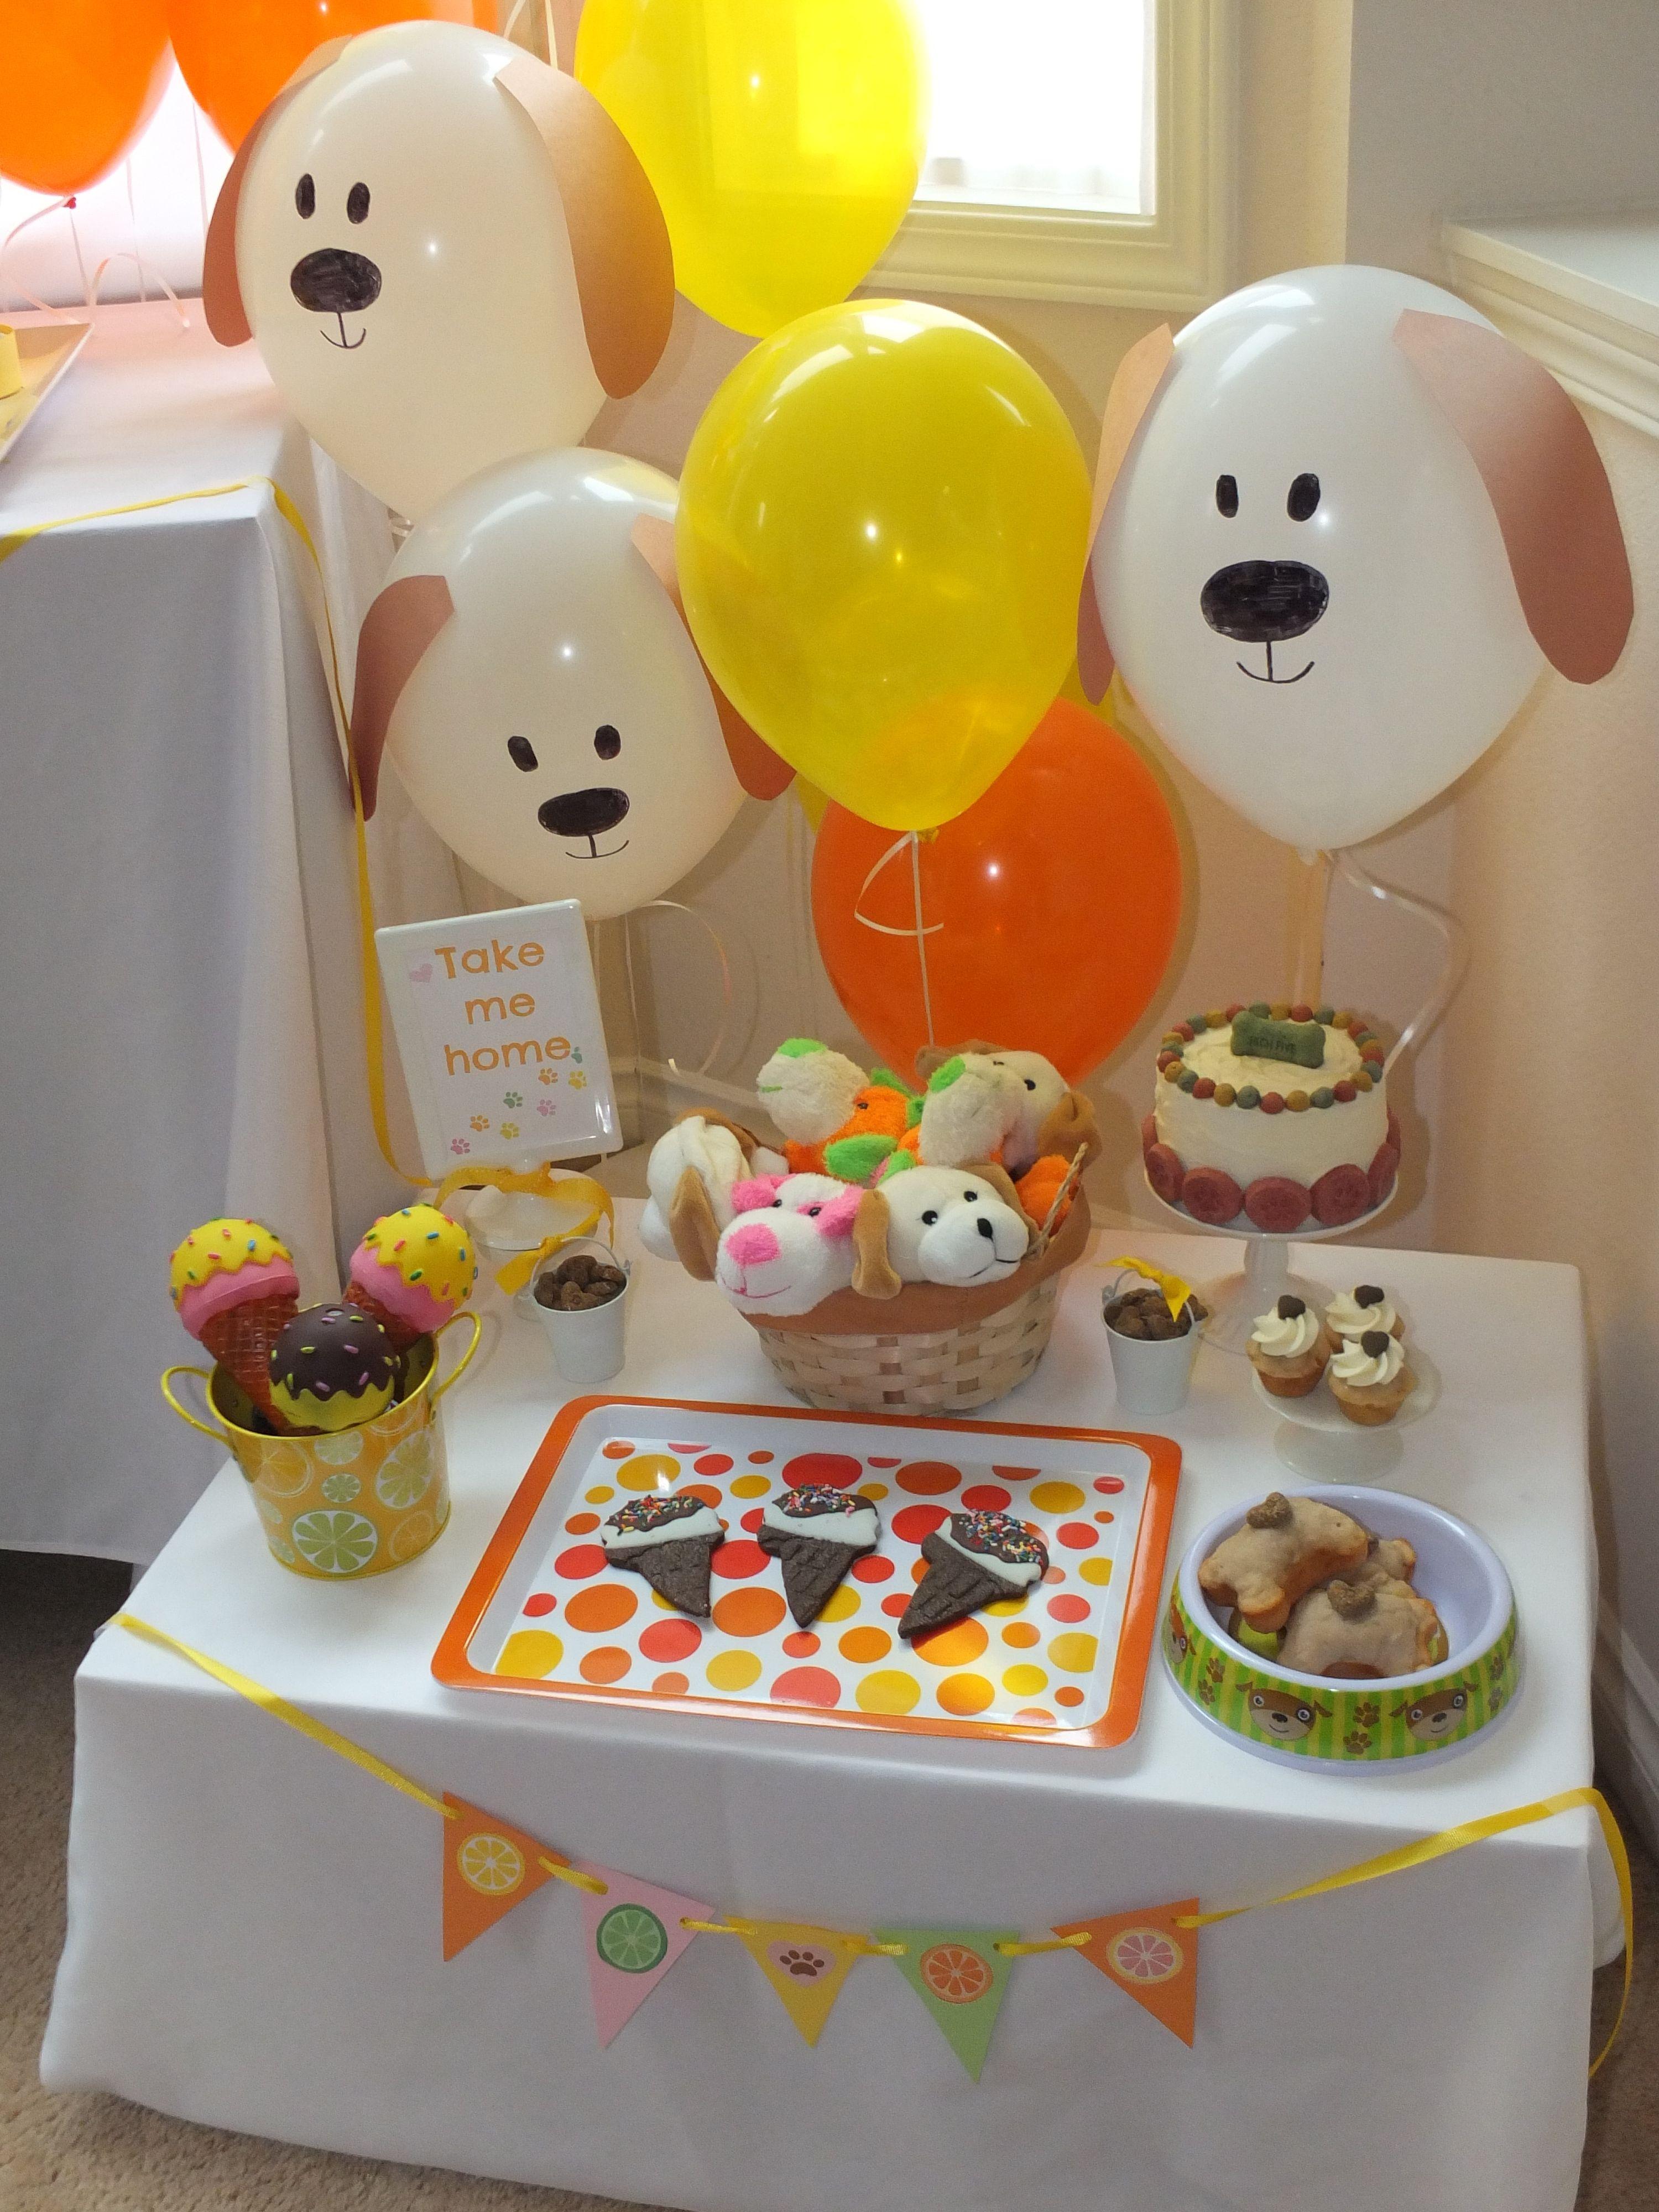 Diy Your Own Dog Balloons Partyonadime Dog Birthday Party Dog Themed Birthday Party Paw Patrol Birthday Party